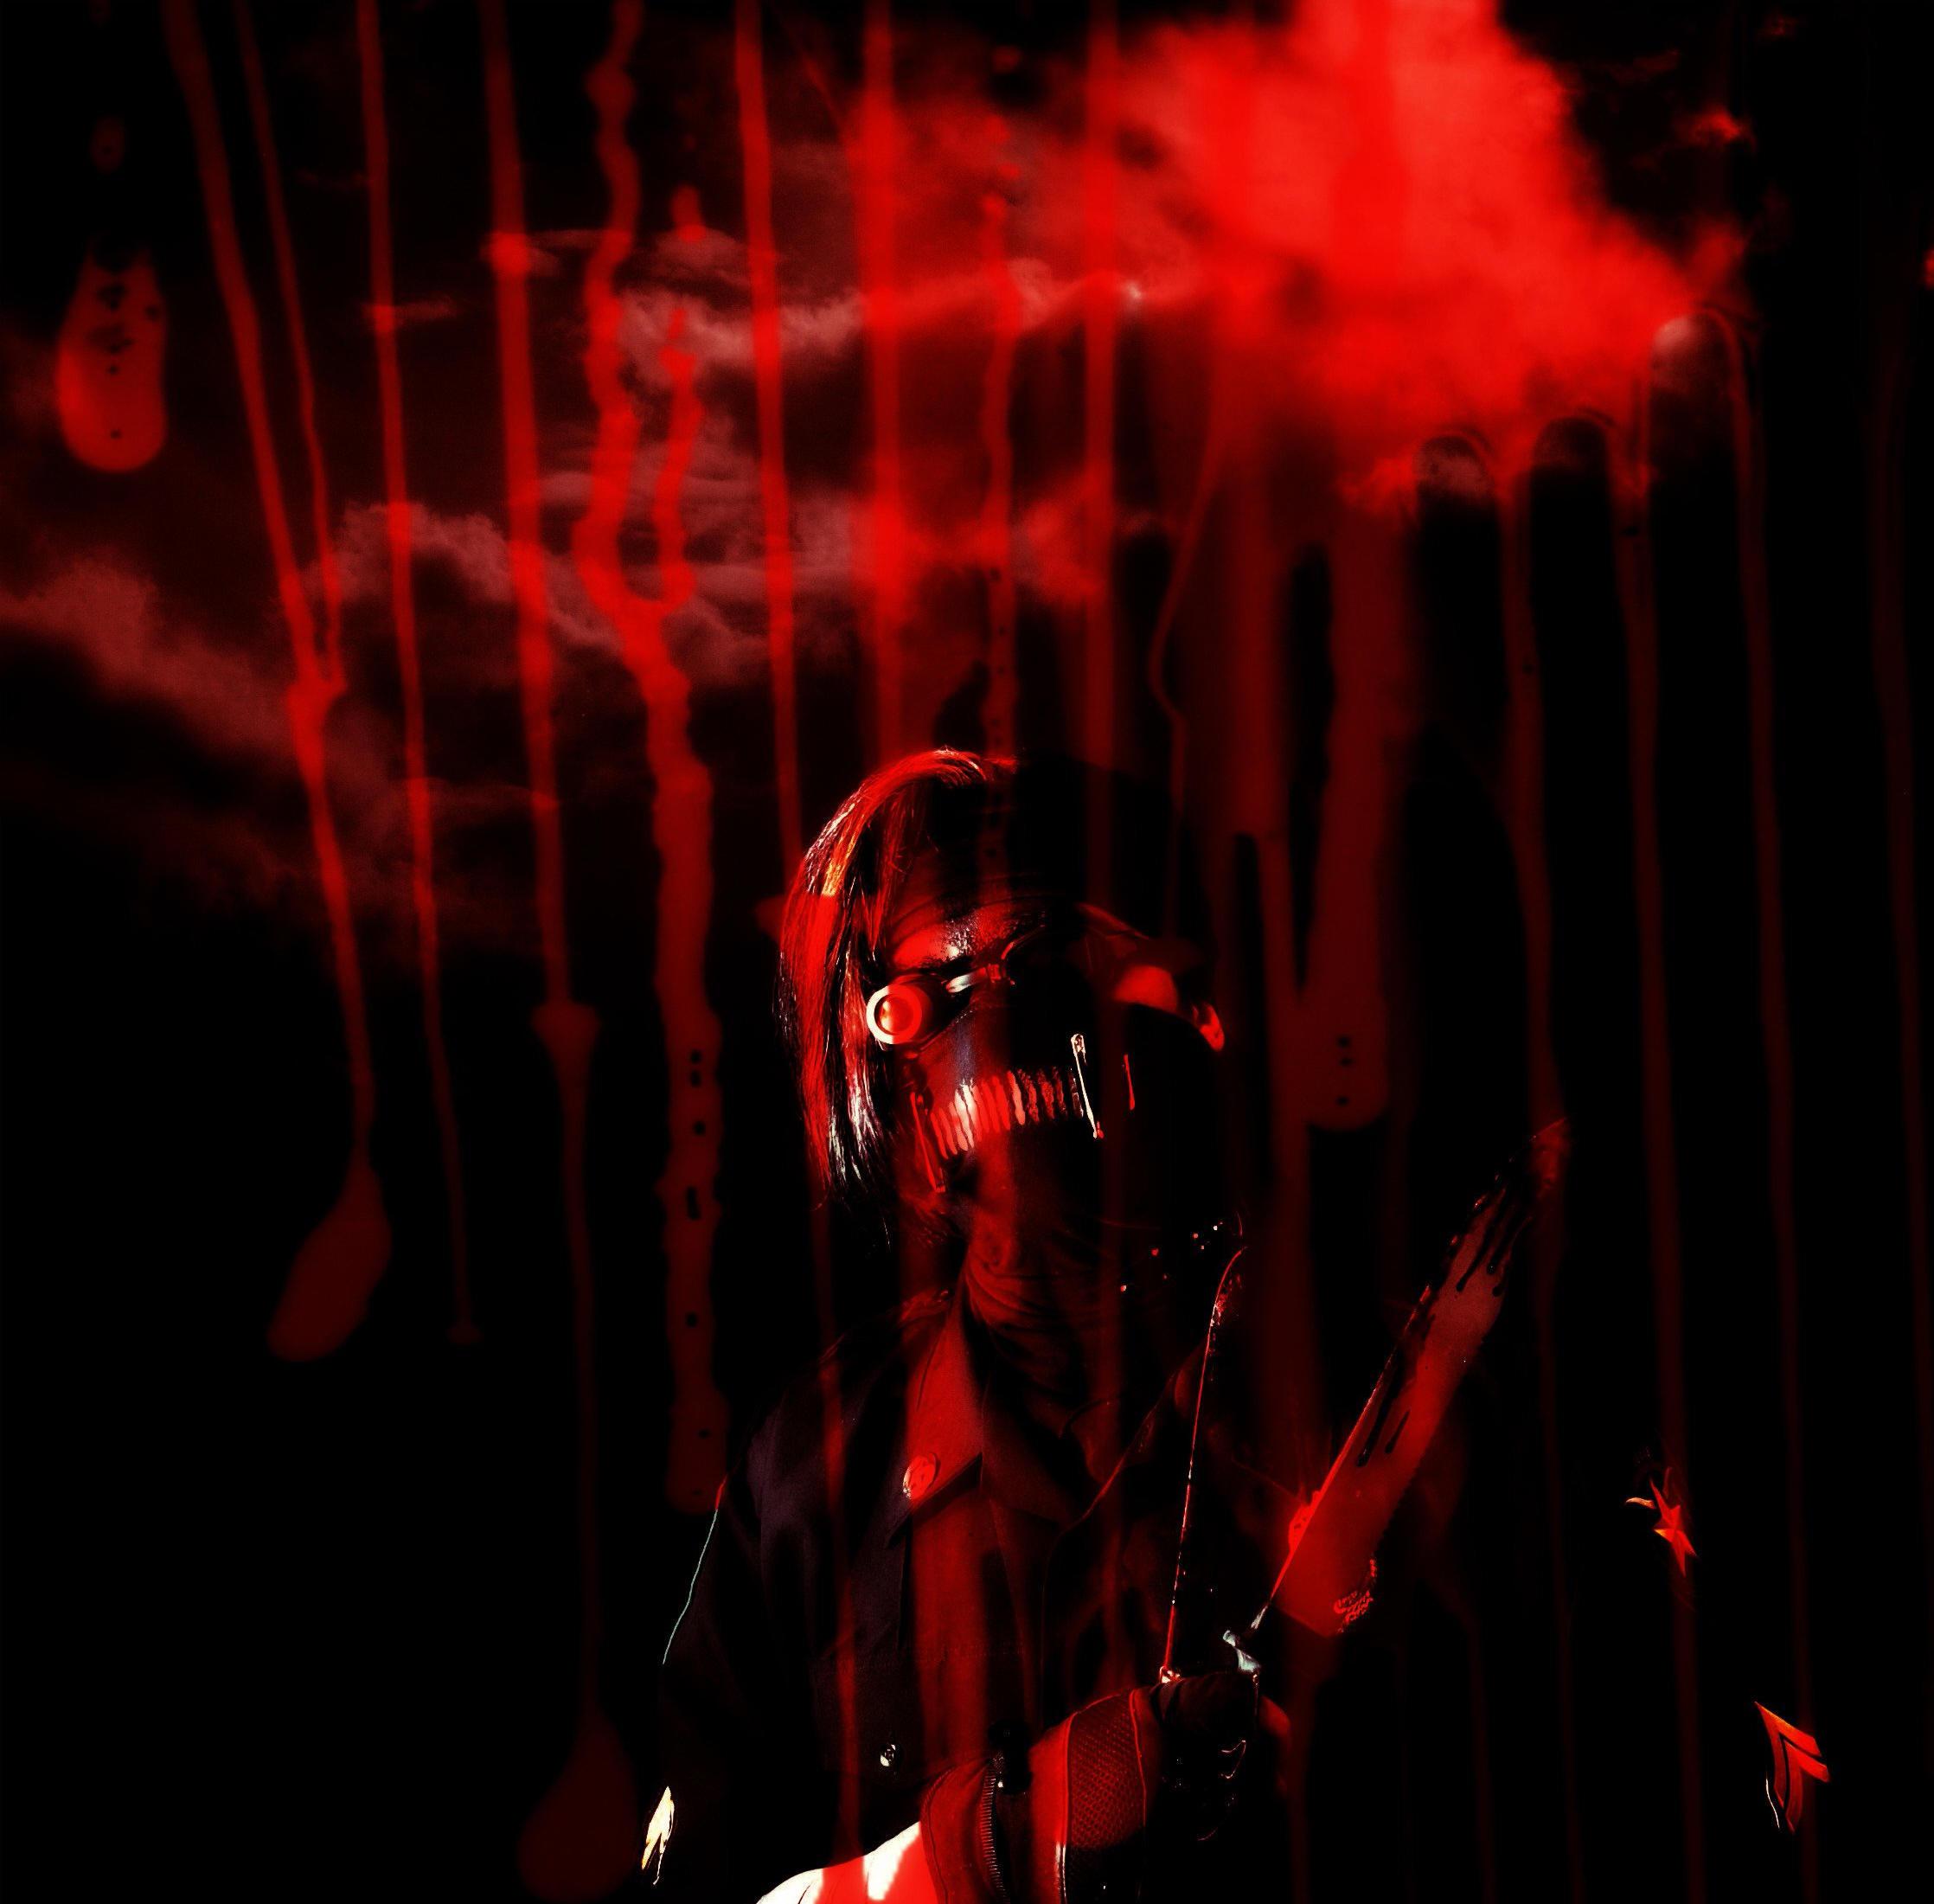 blood rain wallpaper - photo #10